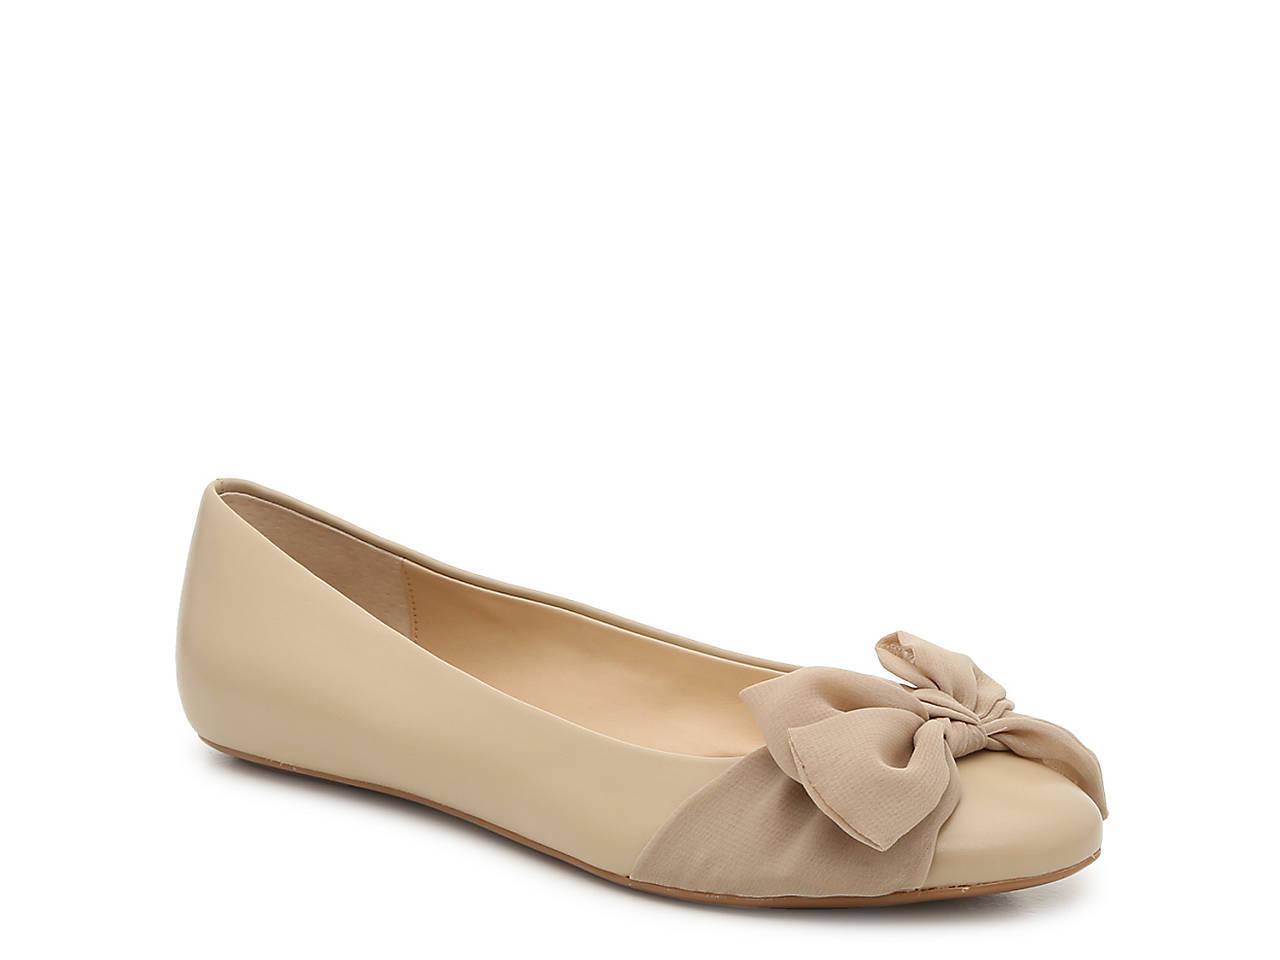 51332491efc6 Isaac Mizrahi Arielle Ballet Flat Women's Shoes | DSW